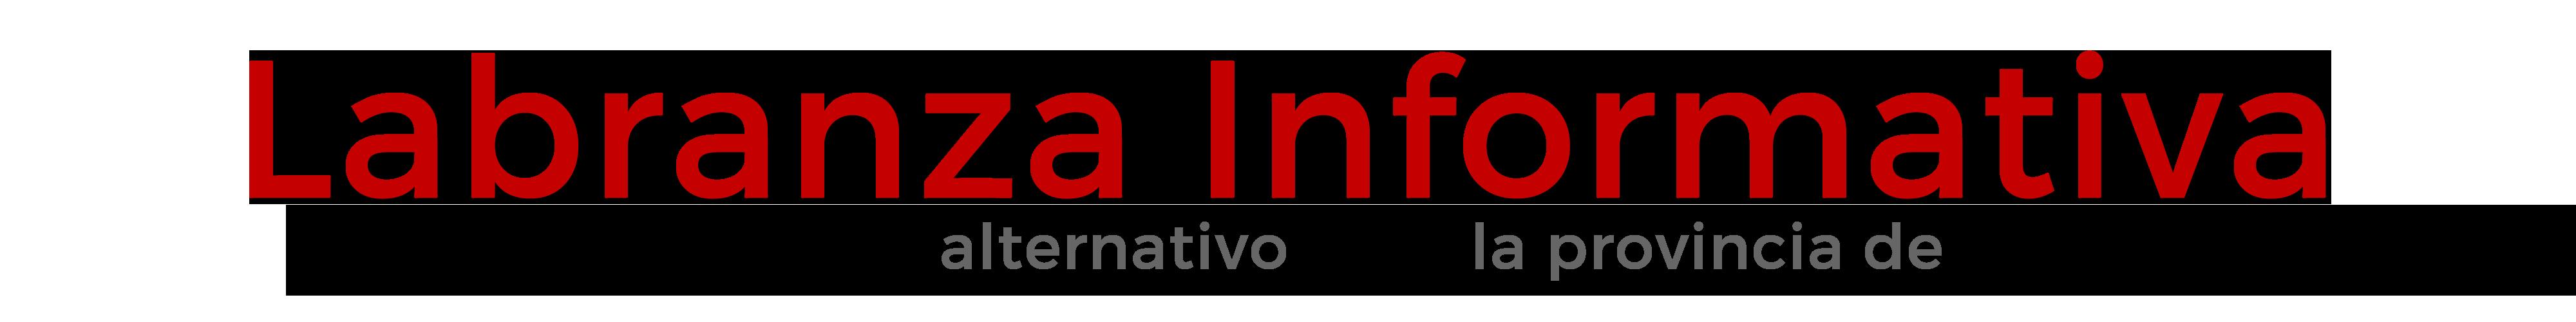 Labranza Informativa Logo